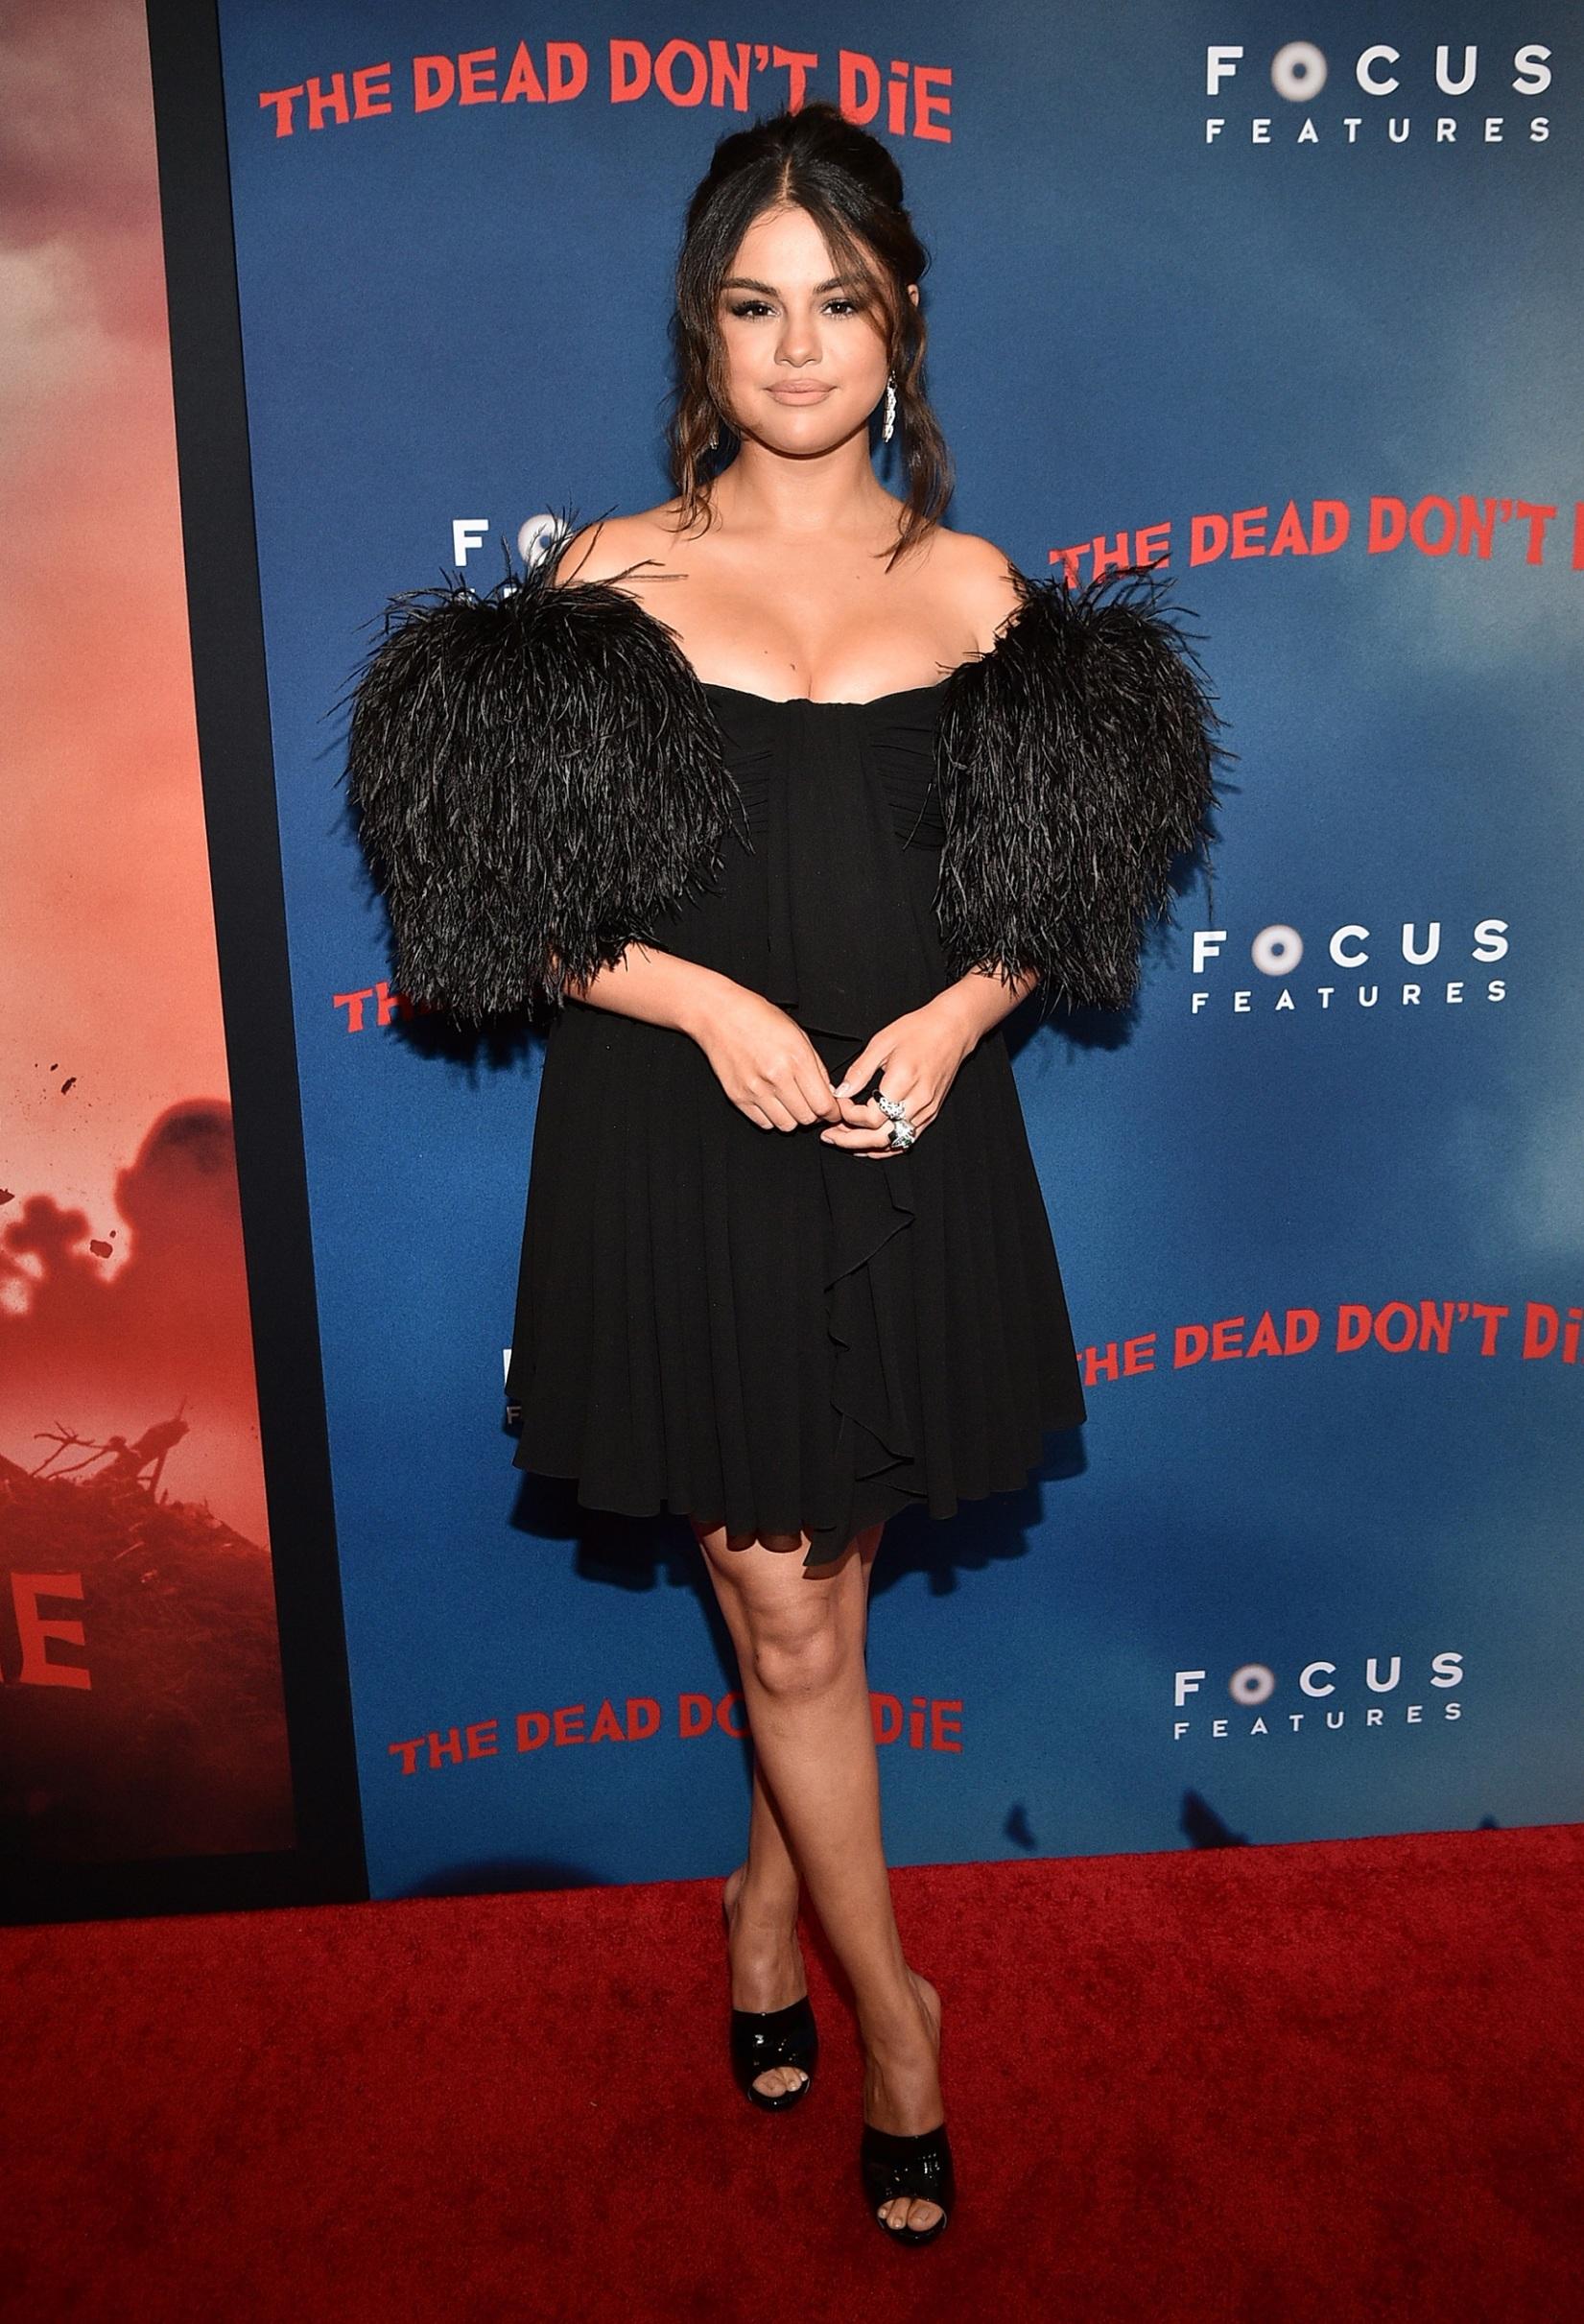 NEW YORK, NEW YORK - JUNE 10:  Selena Gomez attends